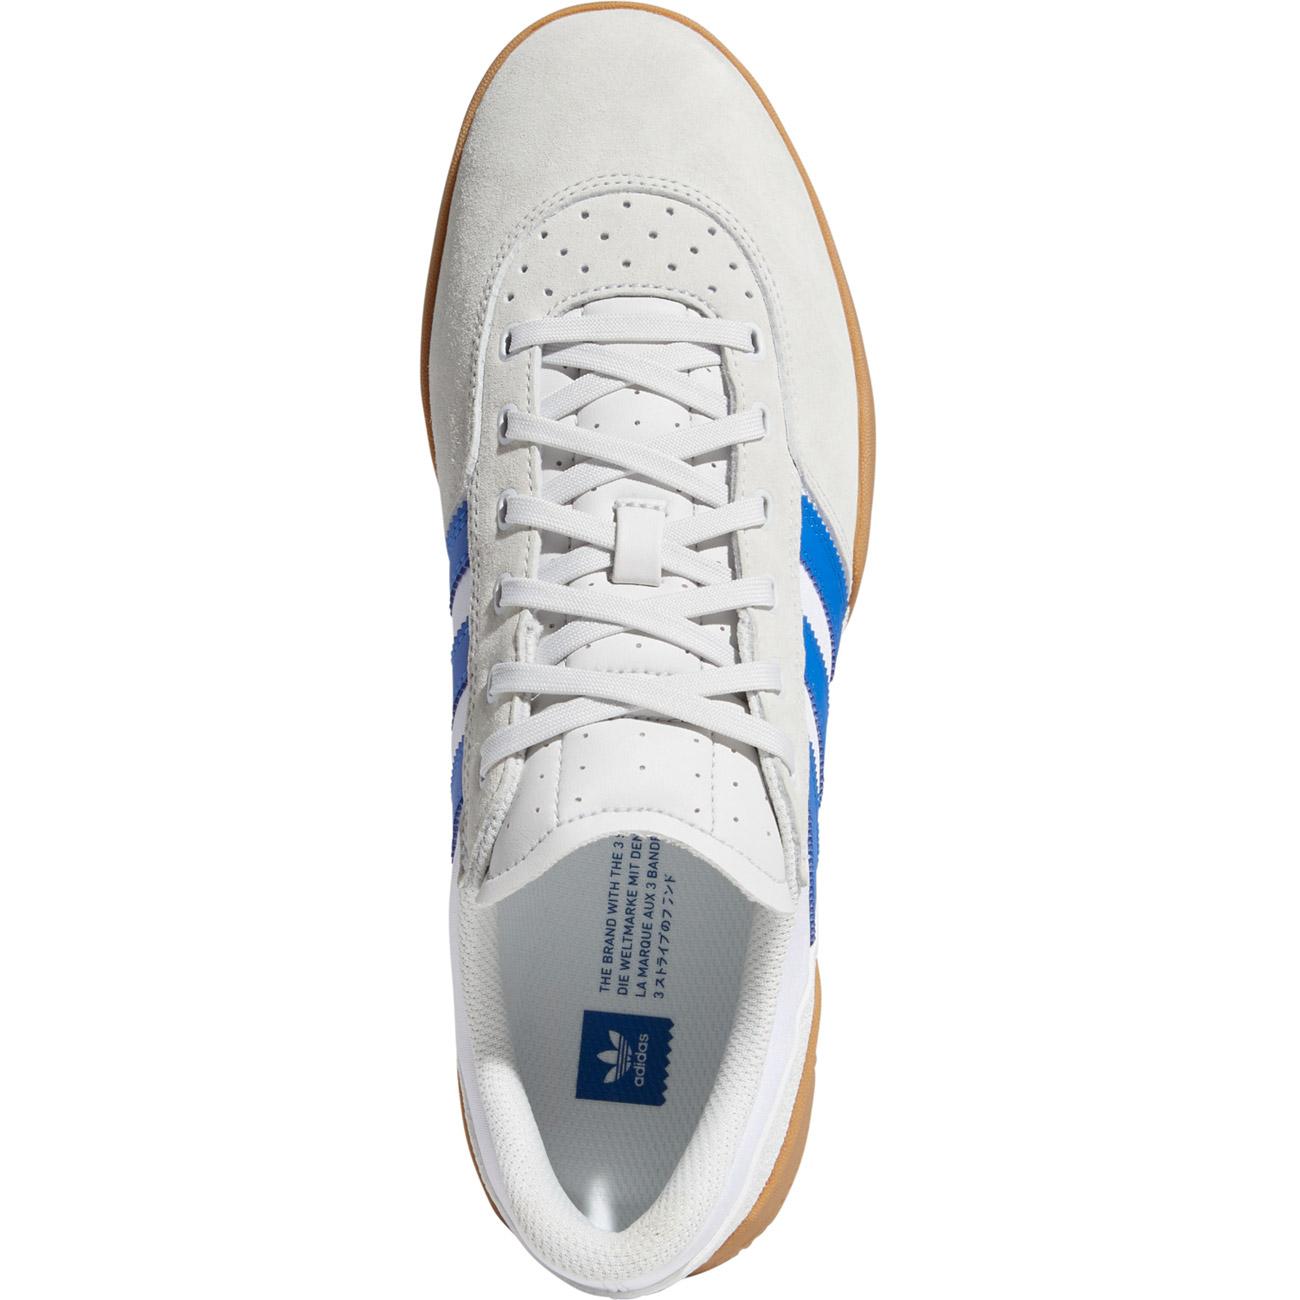 Adidas Skateboarding Herren Skateschuh CITY CUP